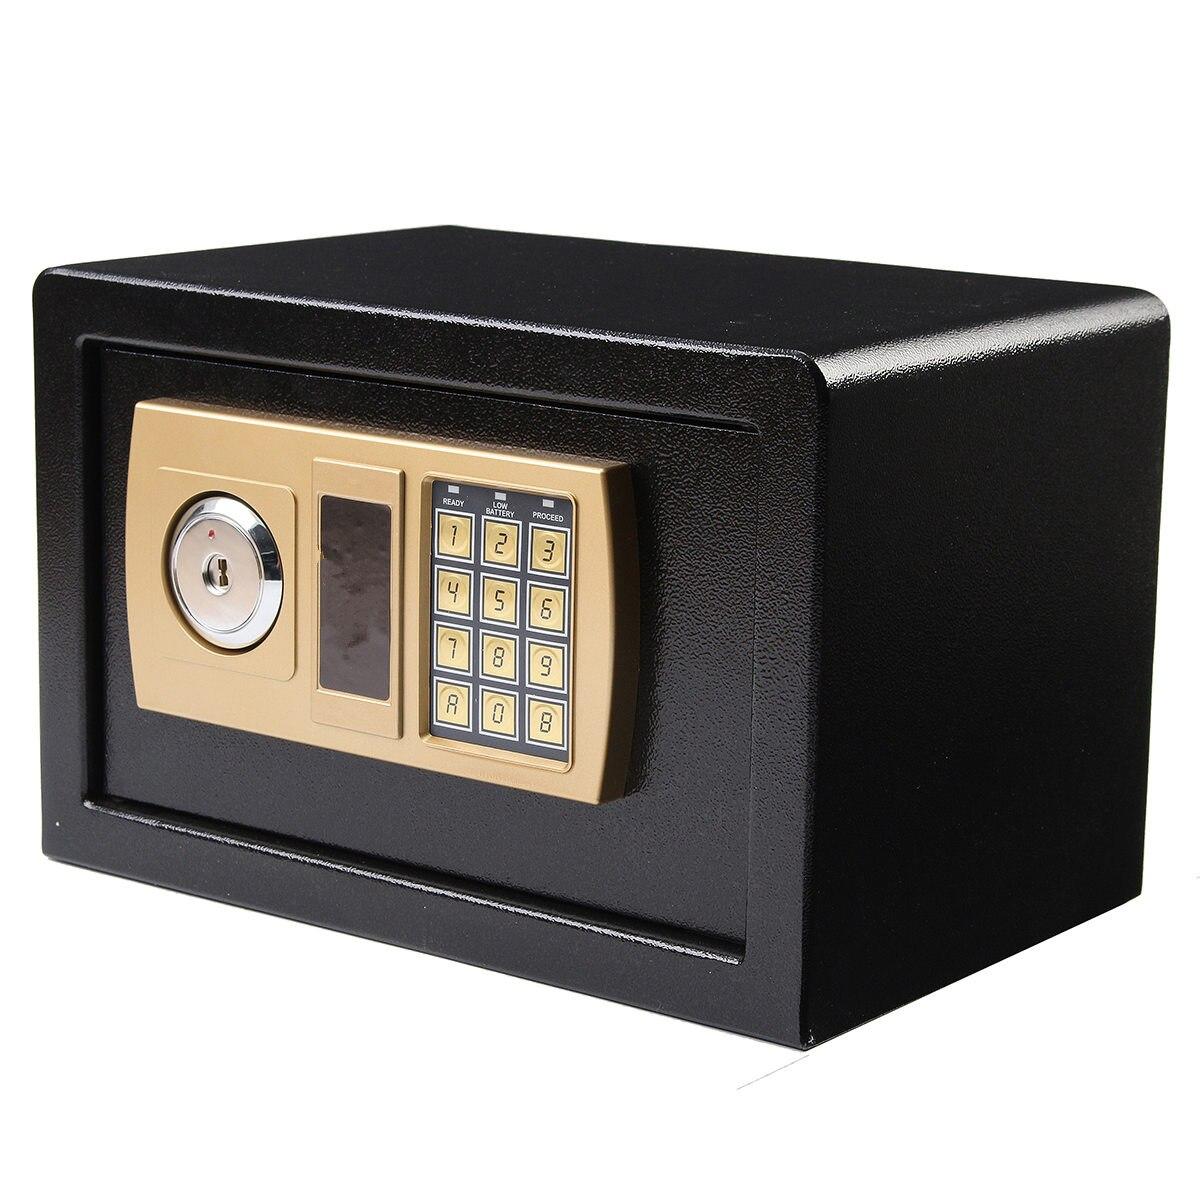 Safurance Luxury Digital Depository Drop Cash Safe Box Jewelry Home Hotel Lock Keypad Black Safety Security Box 2018 Brand New